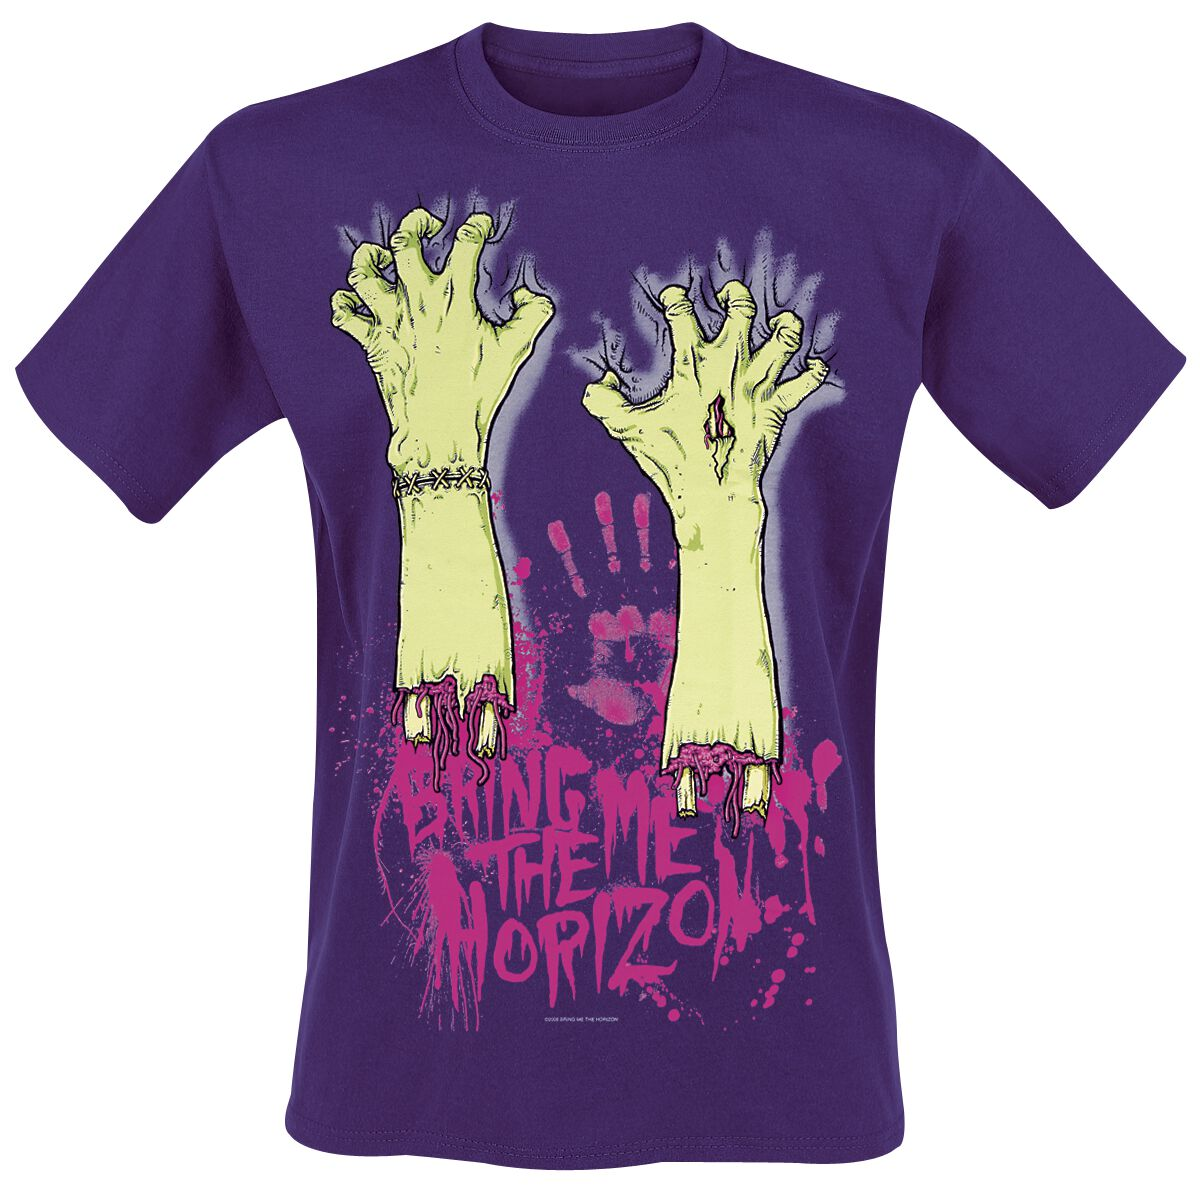 Image of   Bring Me The Horizon Severed Hands T-Shirt lilla